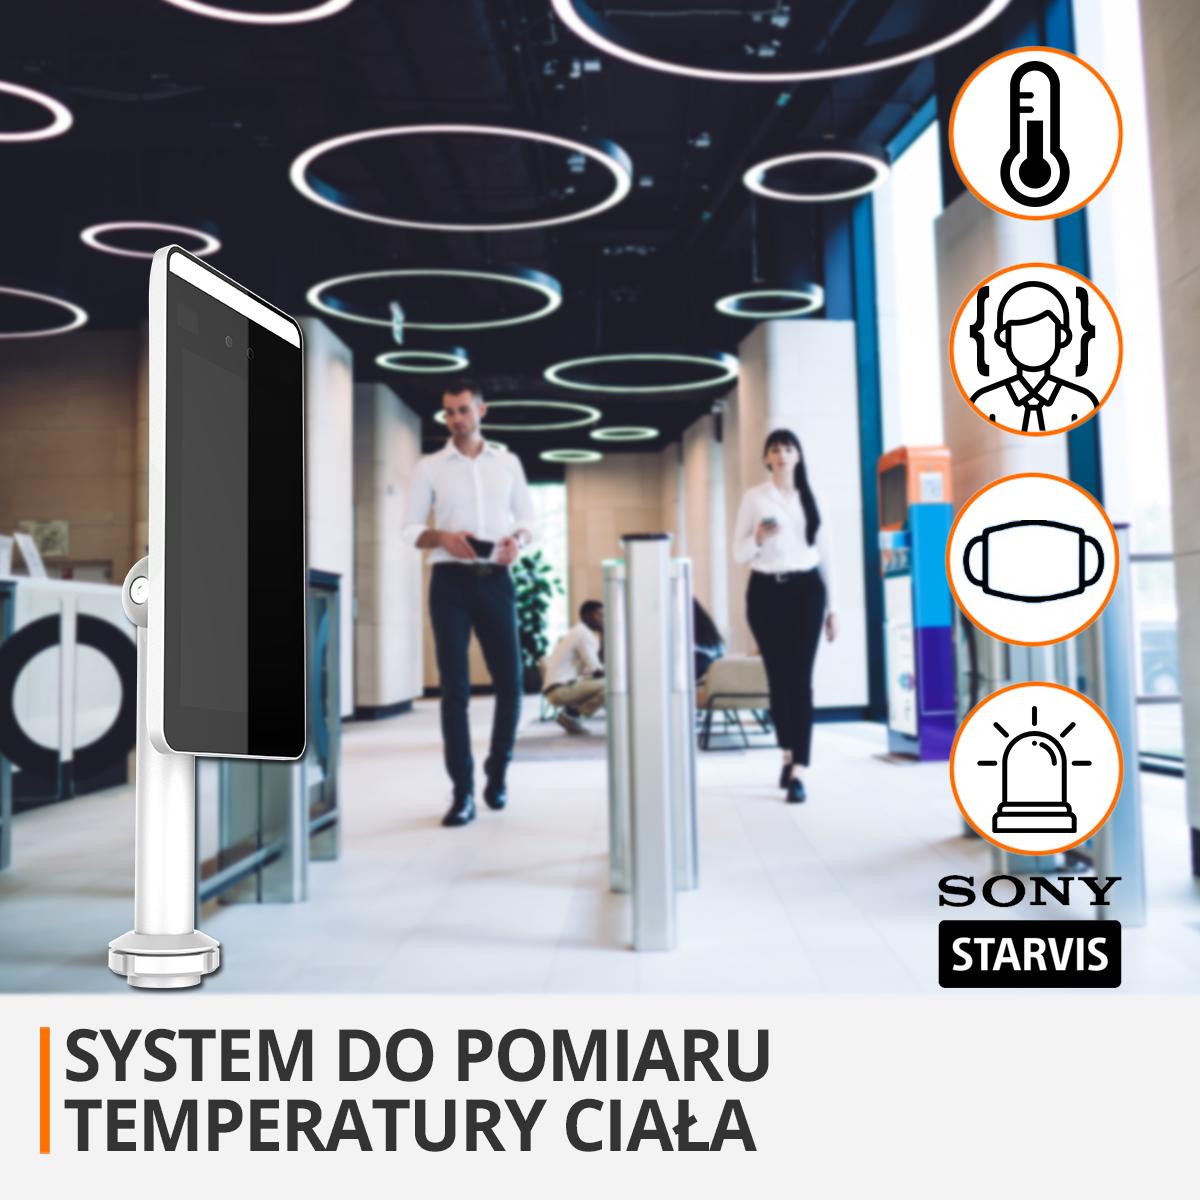 system pomiaru temperatury ciała funkcje orllo.pl